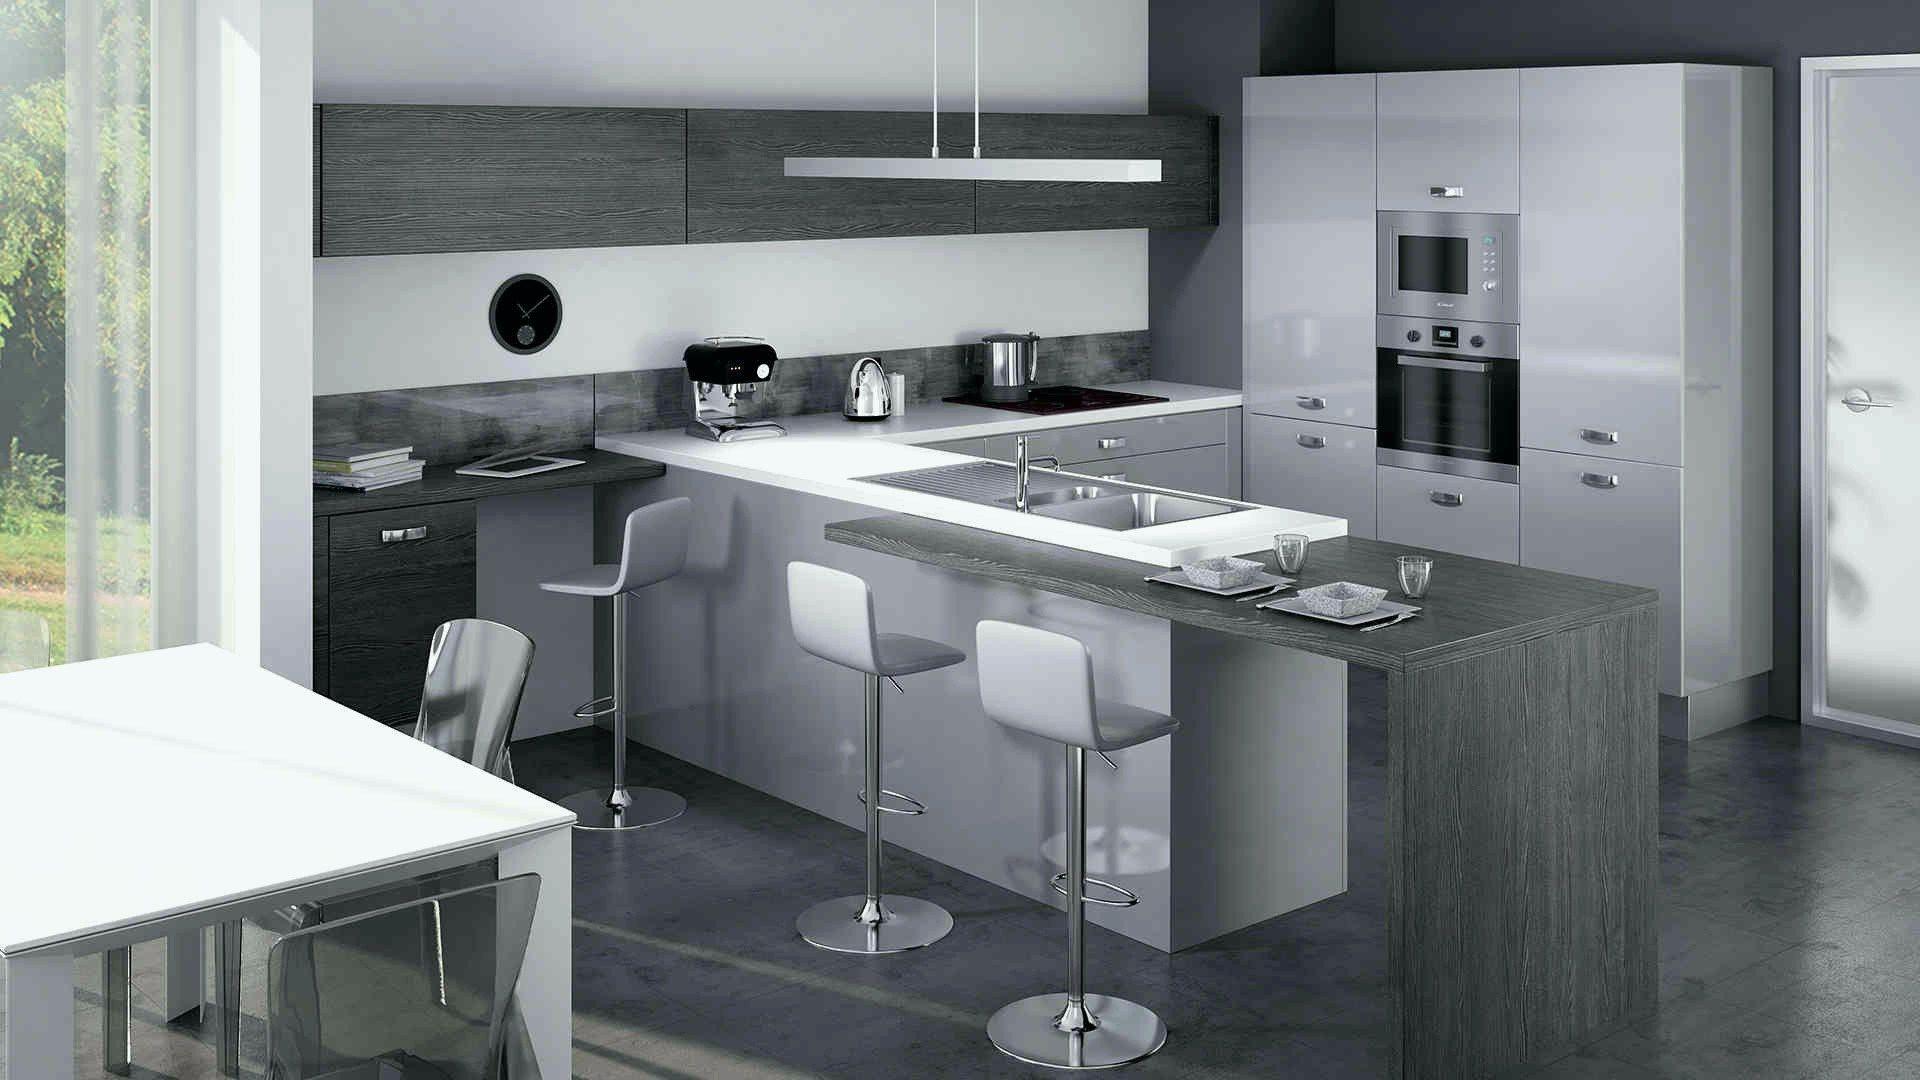 New Cuisine Luna Brico Depot Cuisine Moderne Cuisine Moderne Grise Cuisine Americaine